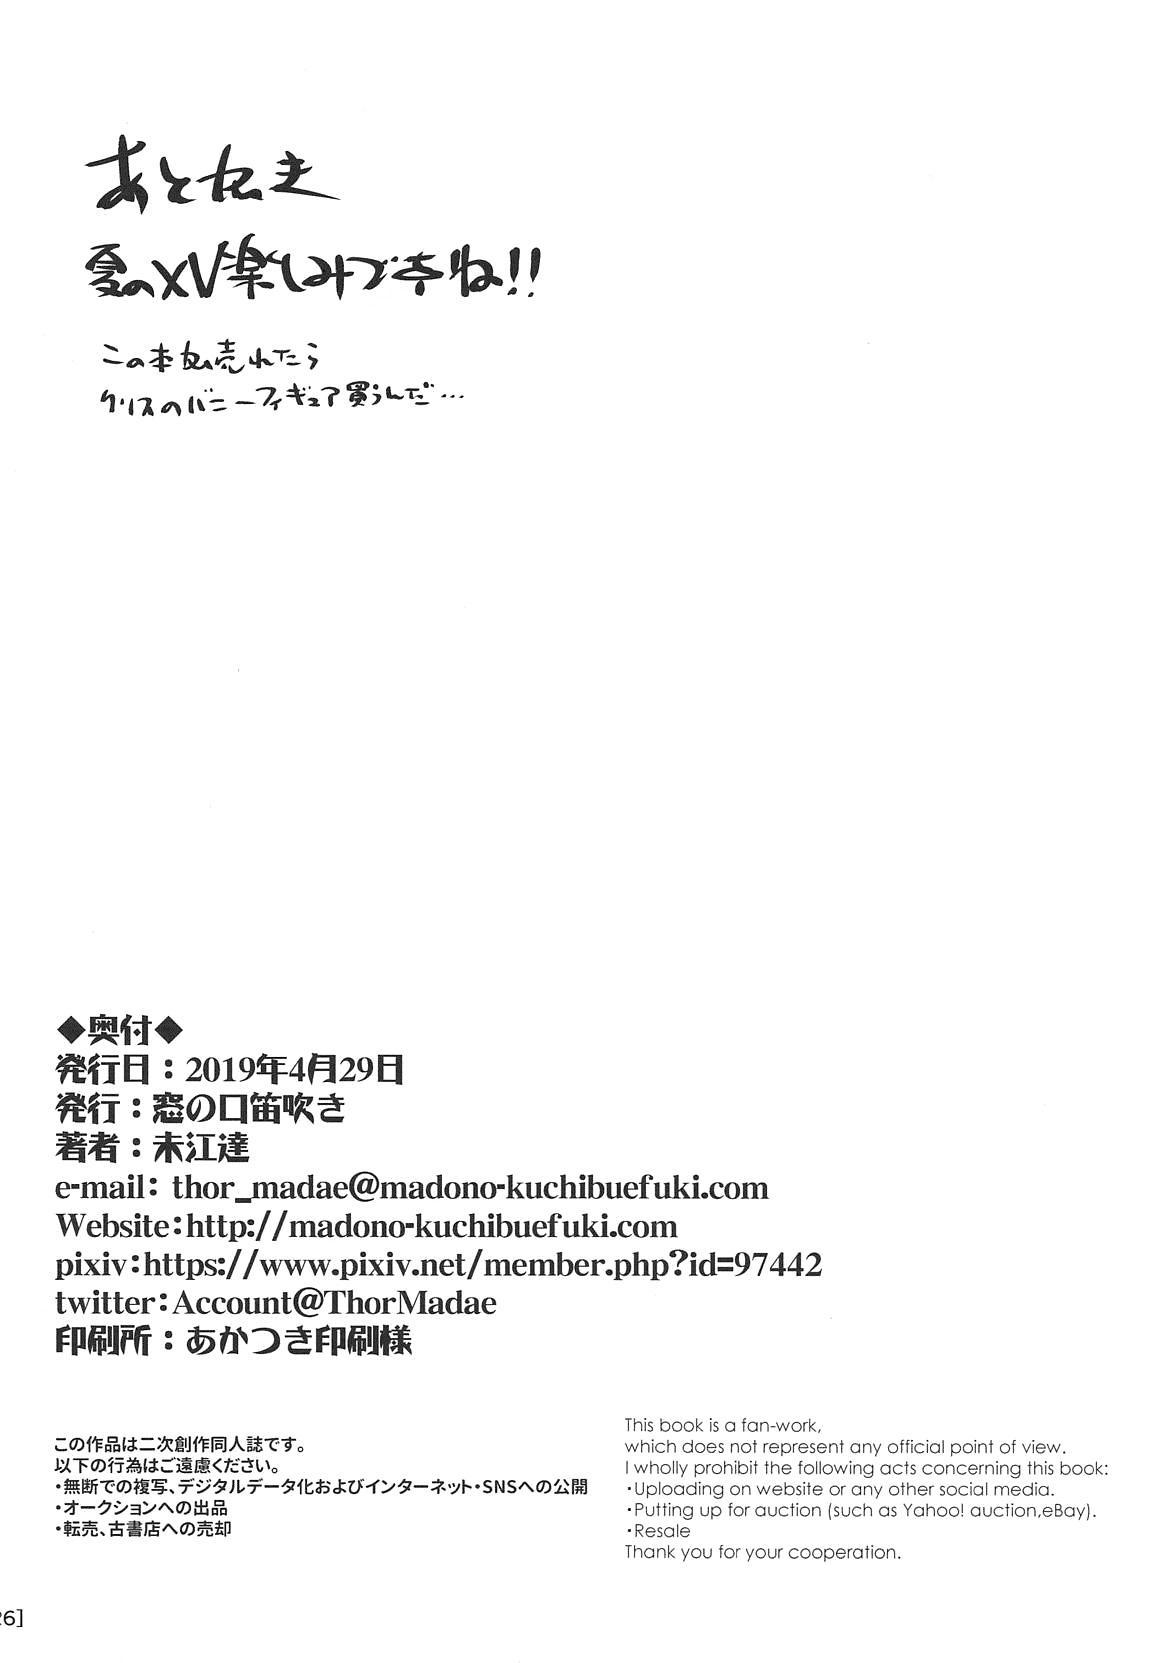 Junjou Karen na Yukine Chris to Love Love Otome na Ecchi 25